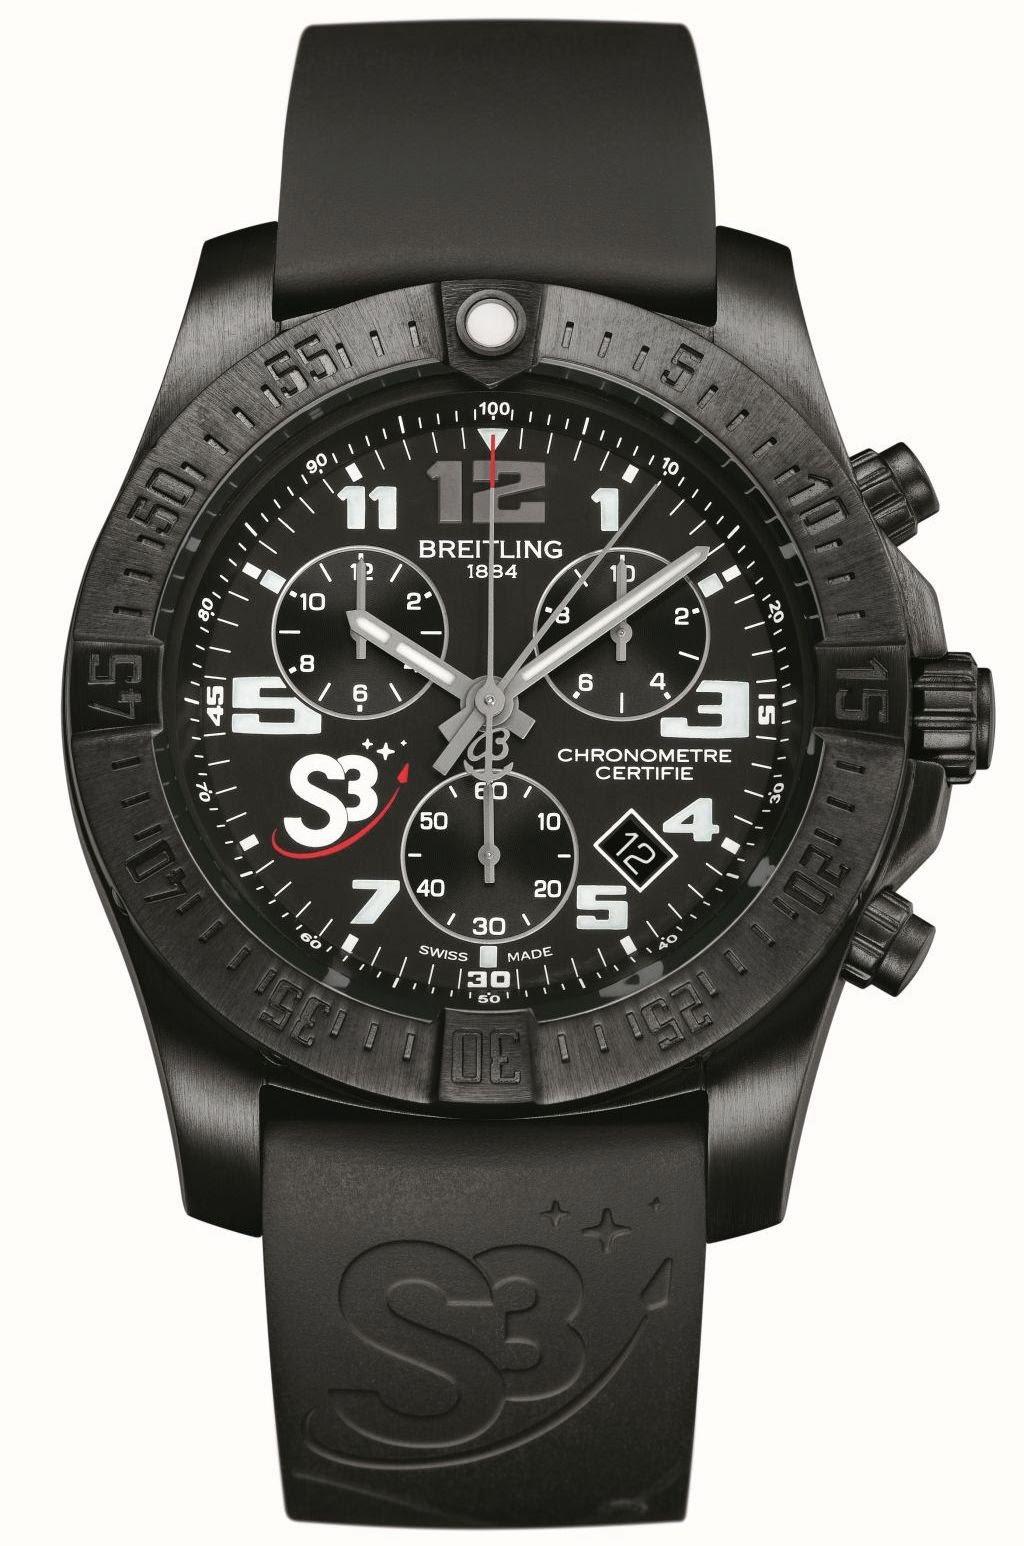 Breitling S3 ZeroG Chronograph replica watch